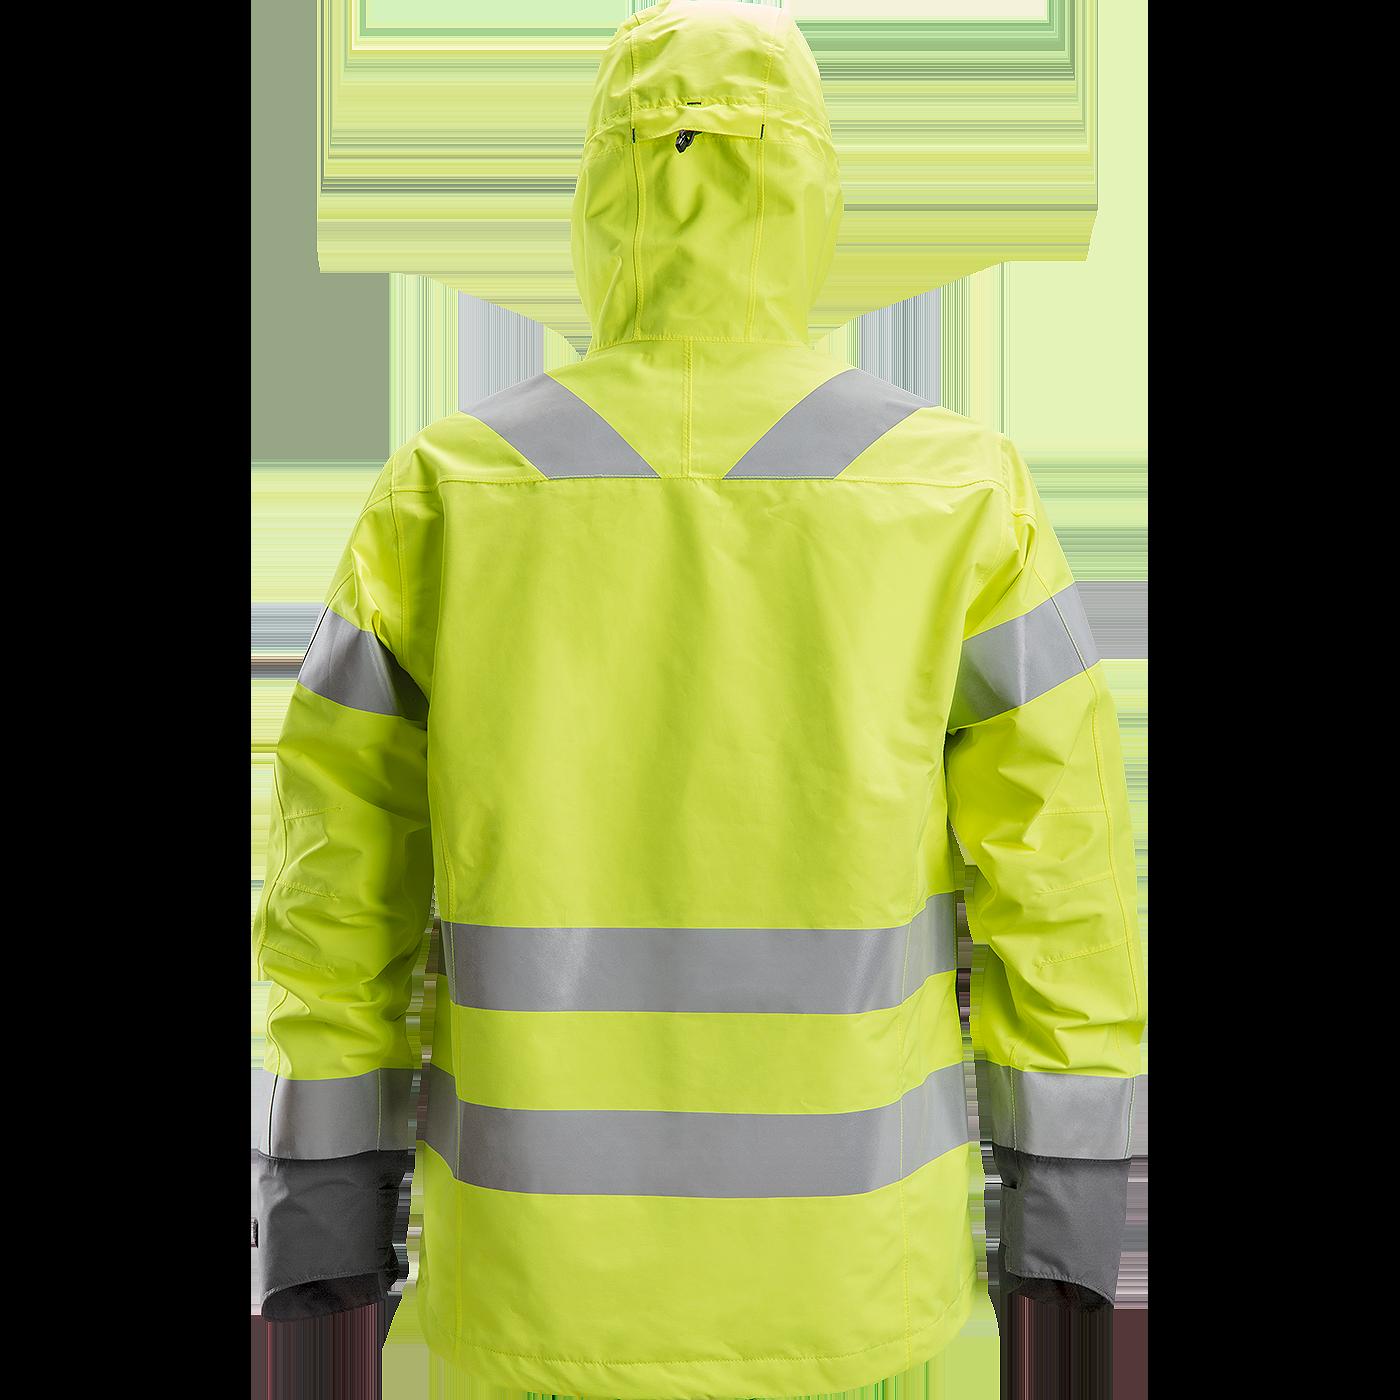 SNICKERS Workwear FlexiWork Softshell брюки из ткани стрейч с навесными карманами